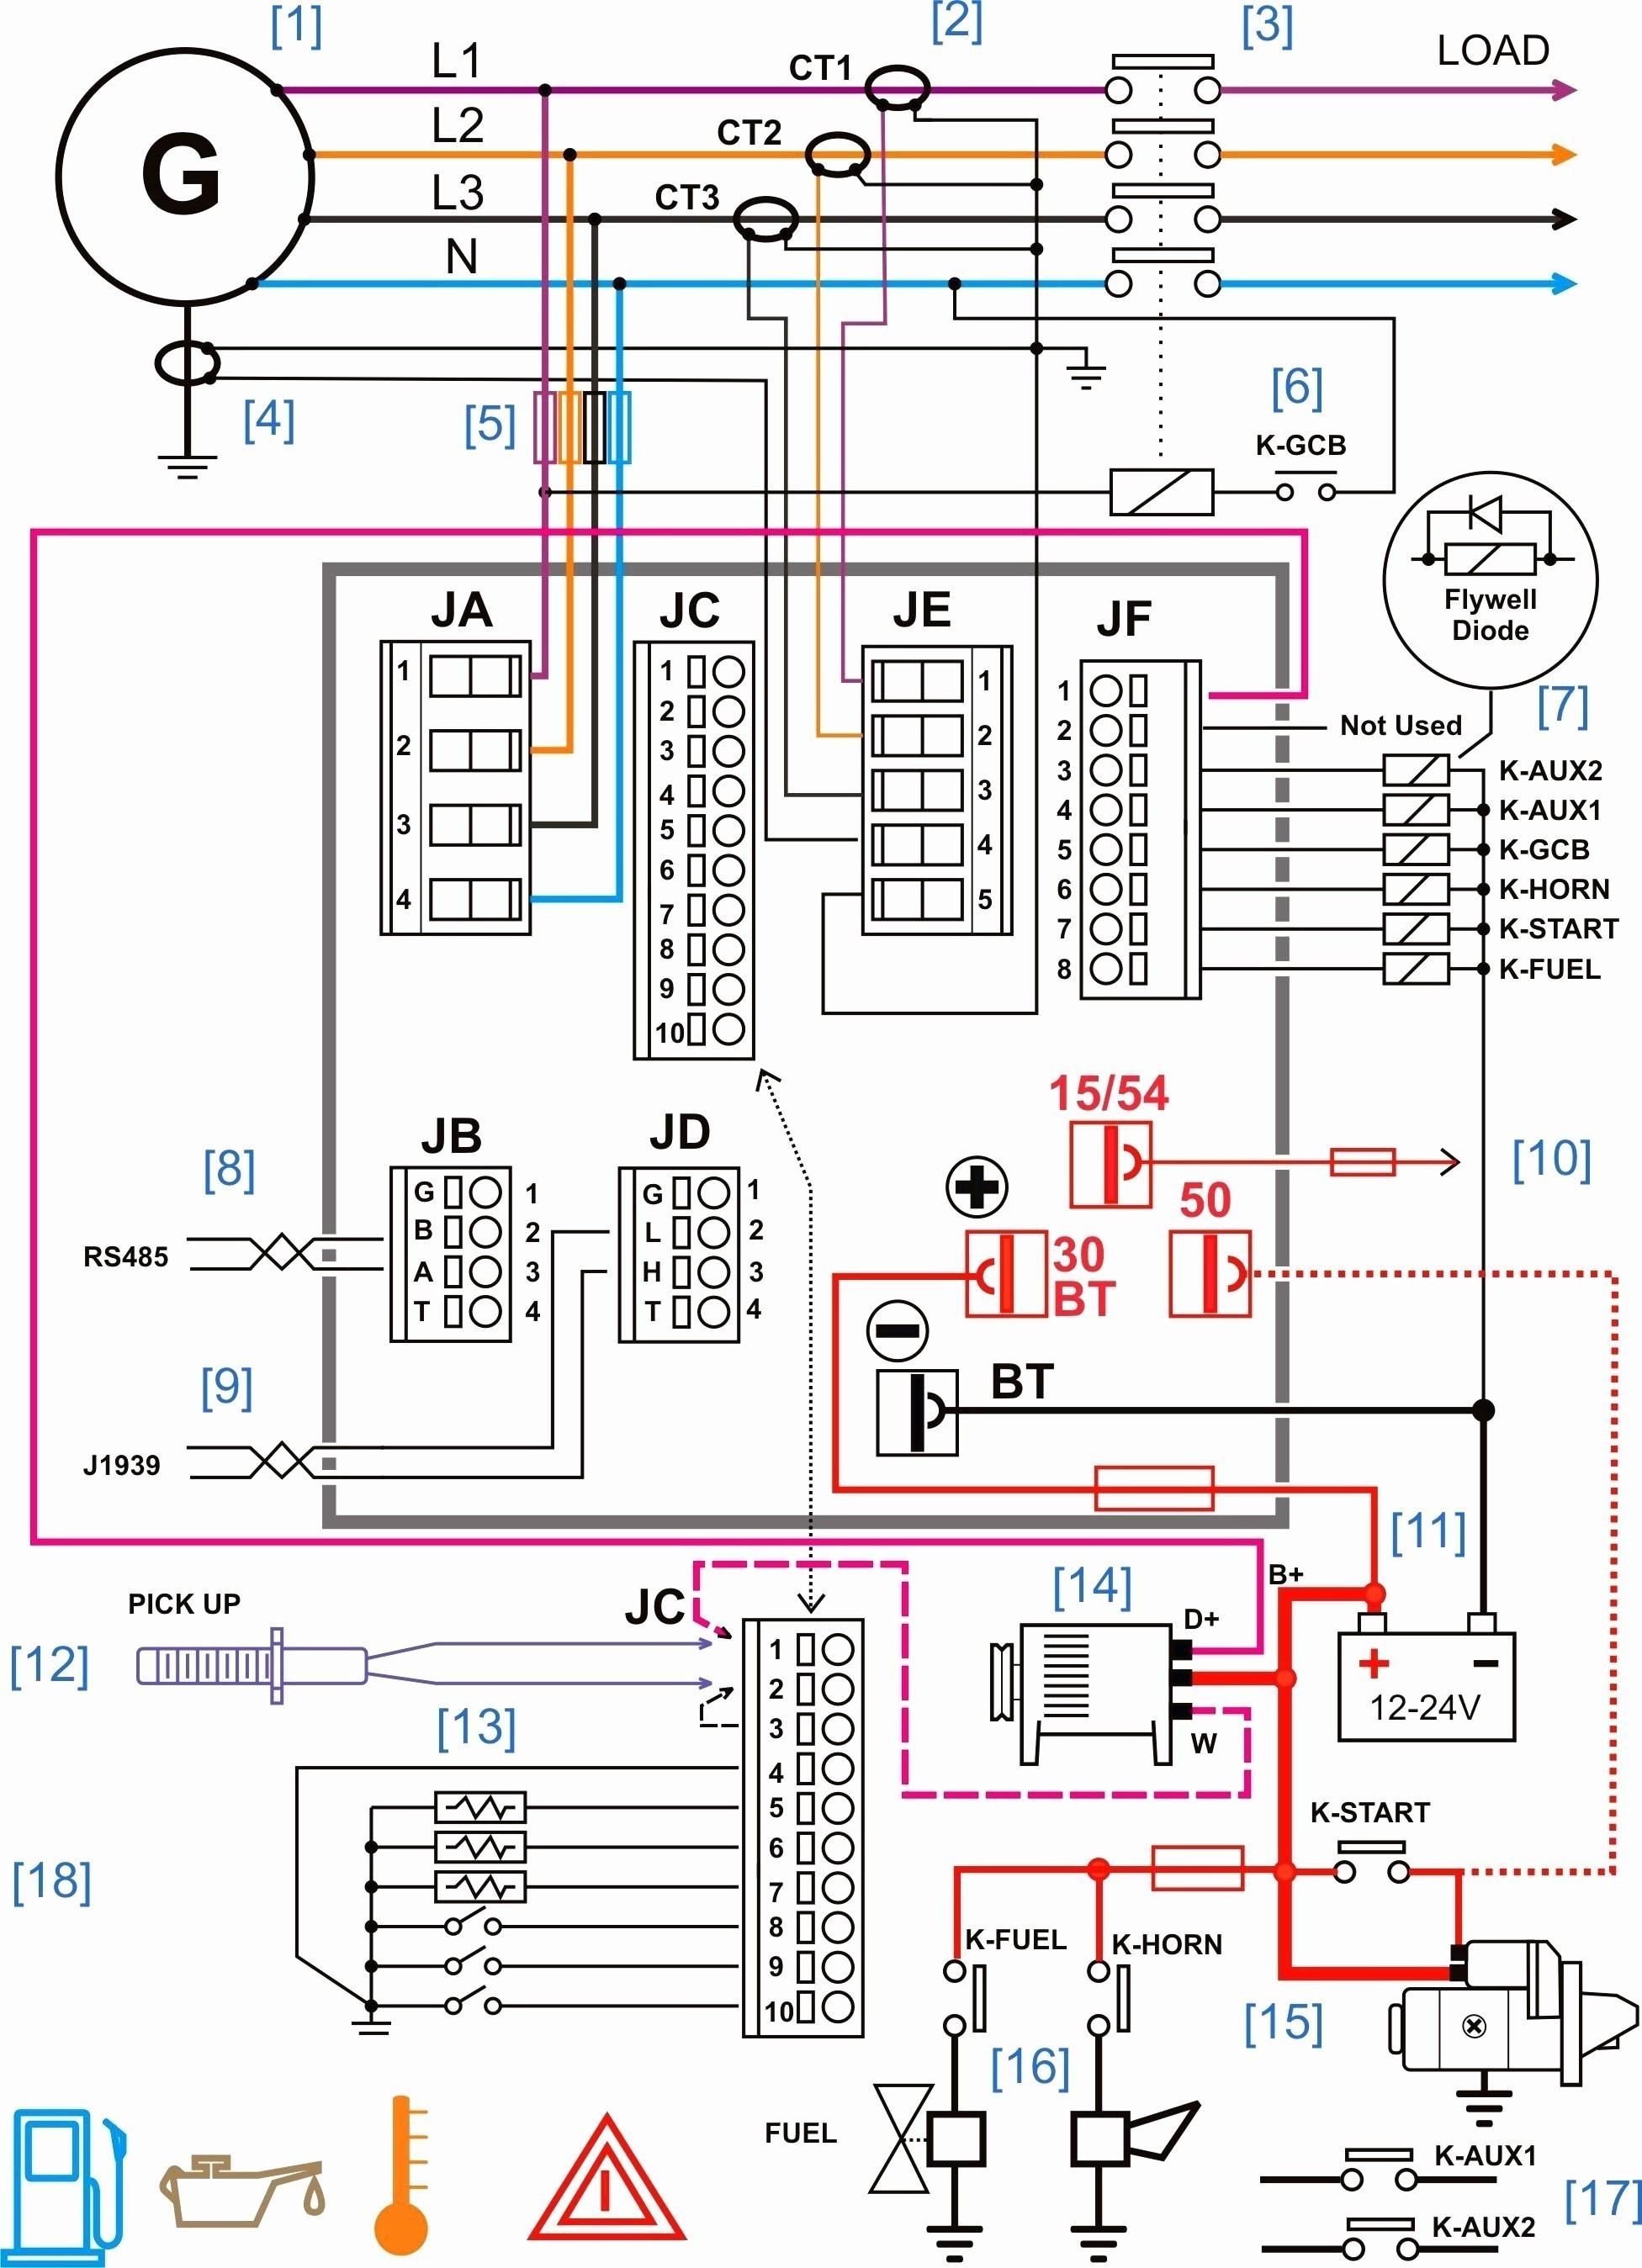 Diagram Of Car Controls Wiring Diagram Book Best Wiring Harness Diagram Book Car Stereo Of Diagram Of Car Controls